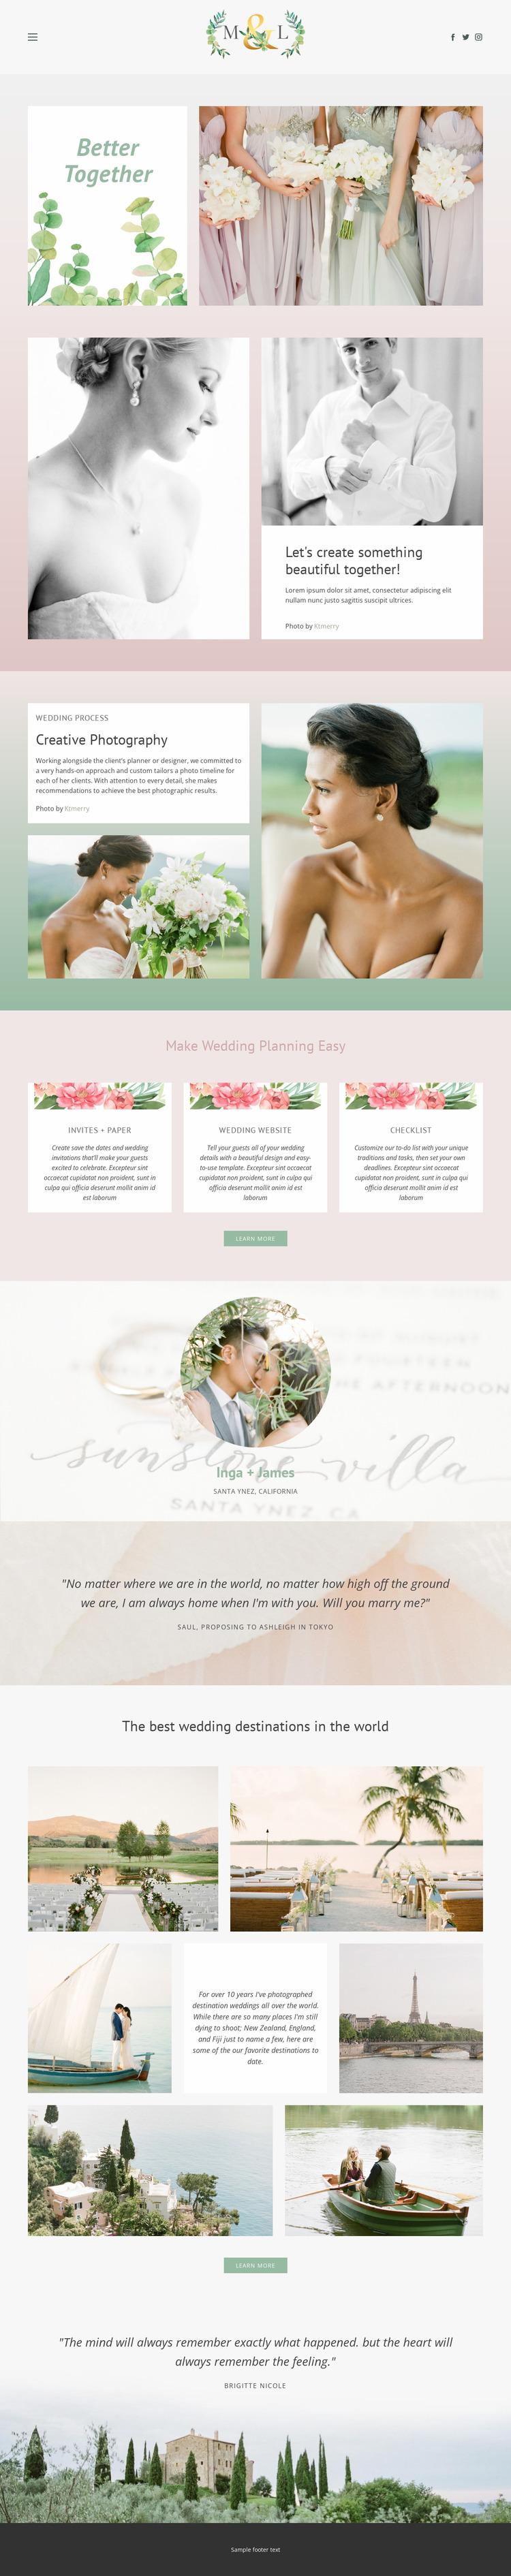 Best photos for wedding Html Website Builder